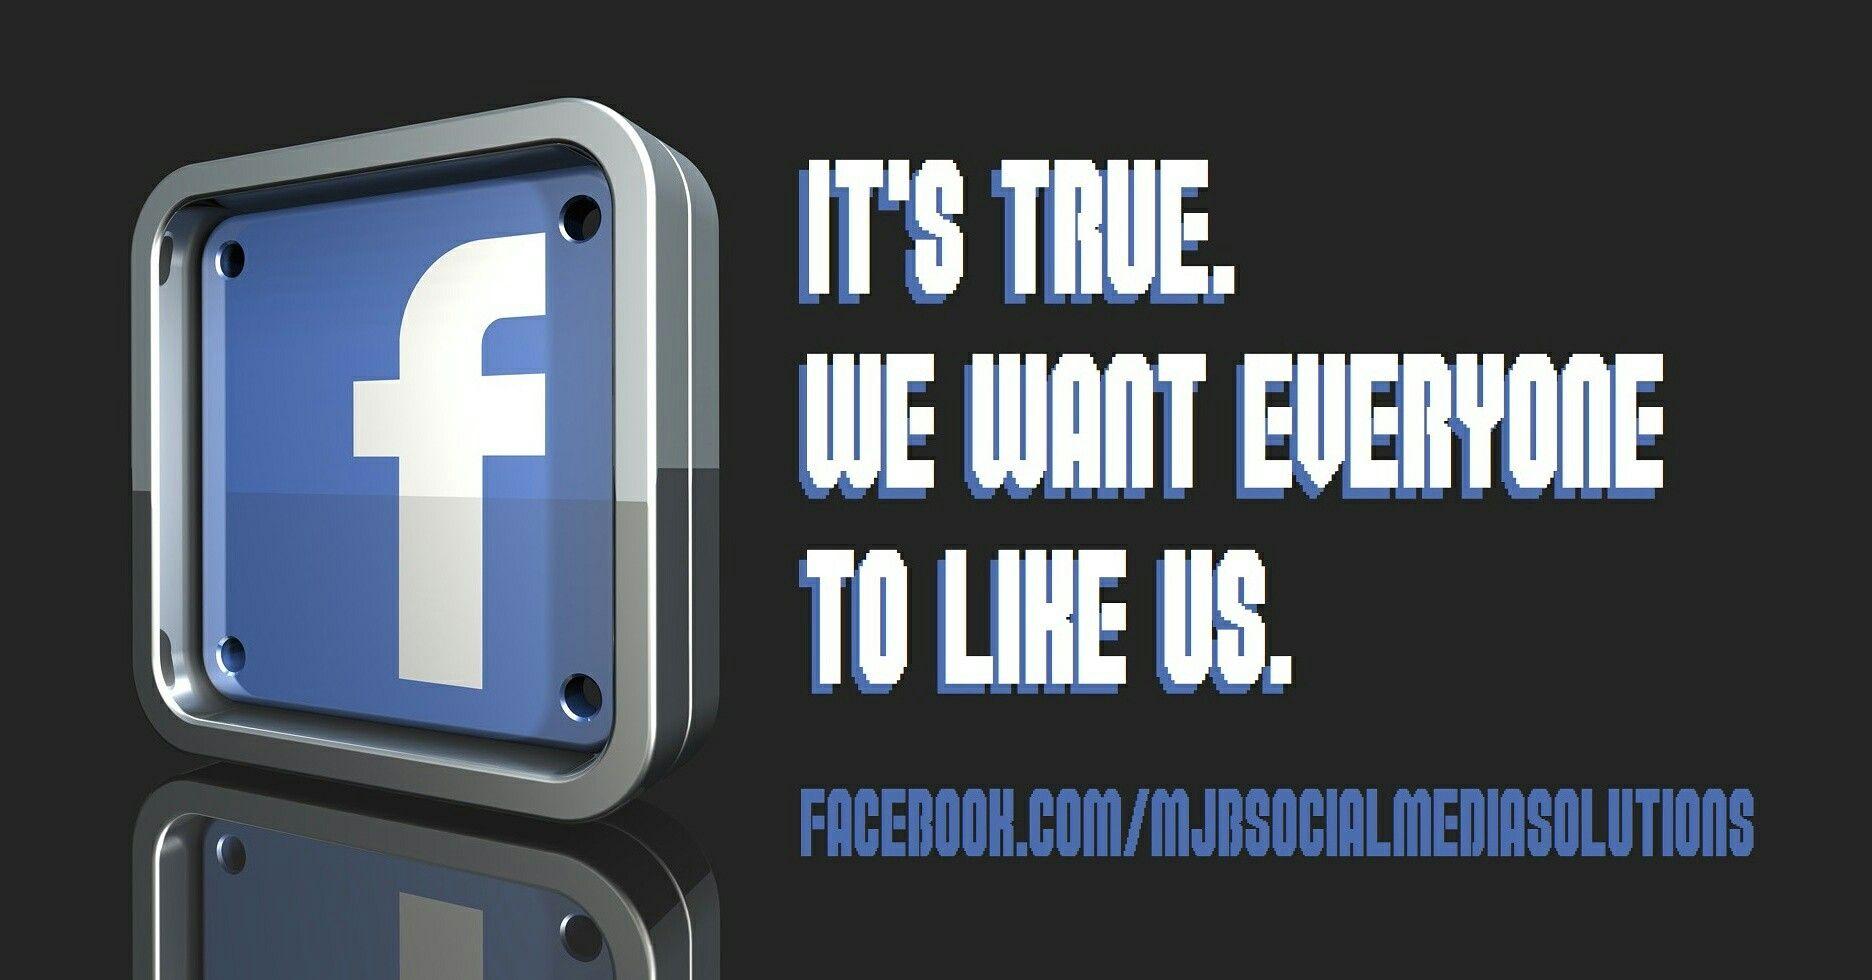 Facebook Likeusonfacebook Likeus Like Socialmedia